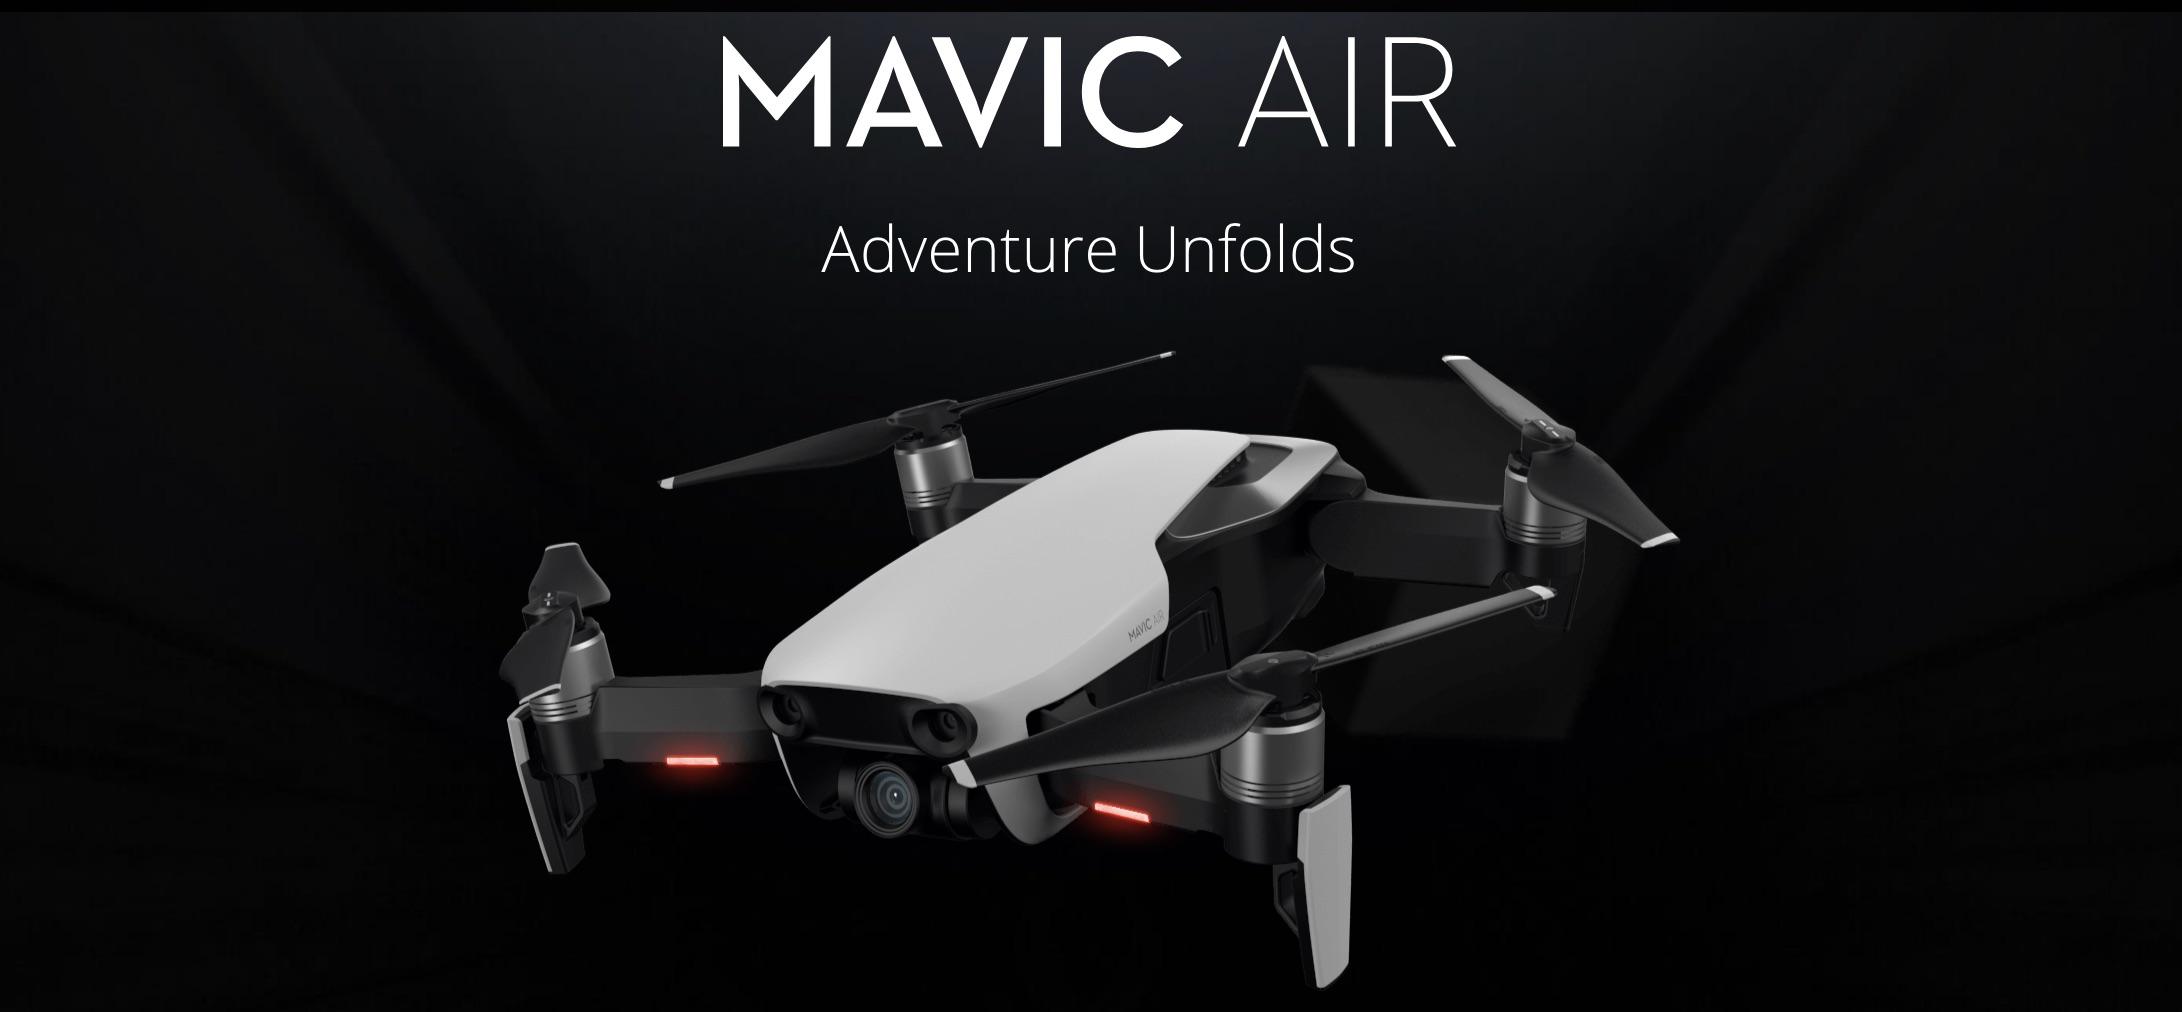 About the Mavic Air